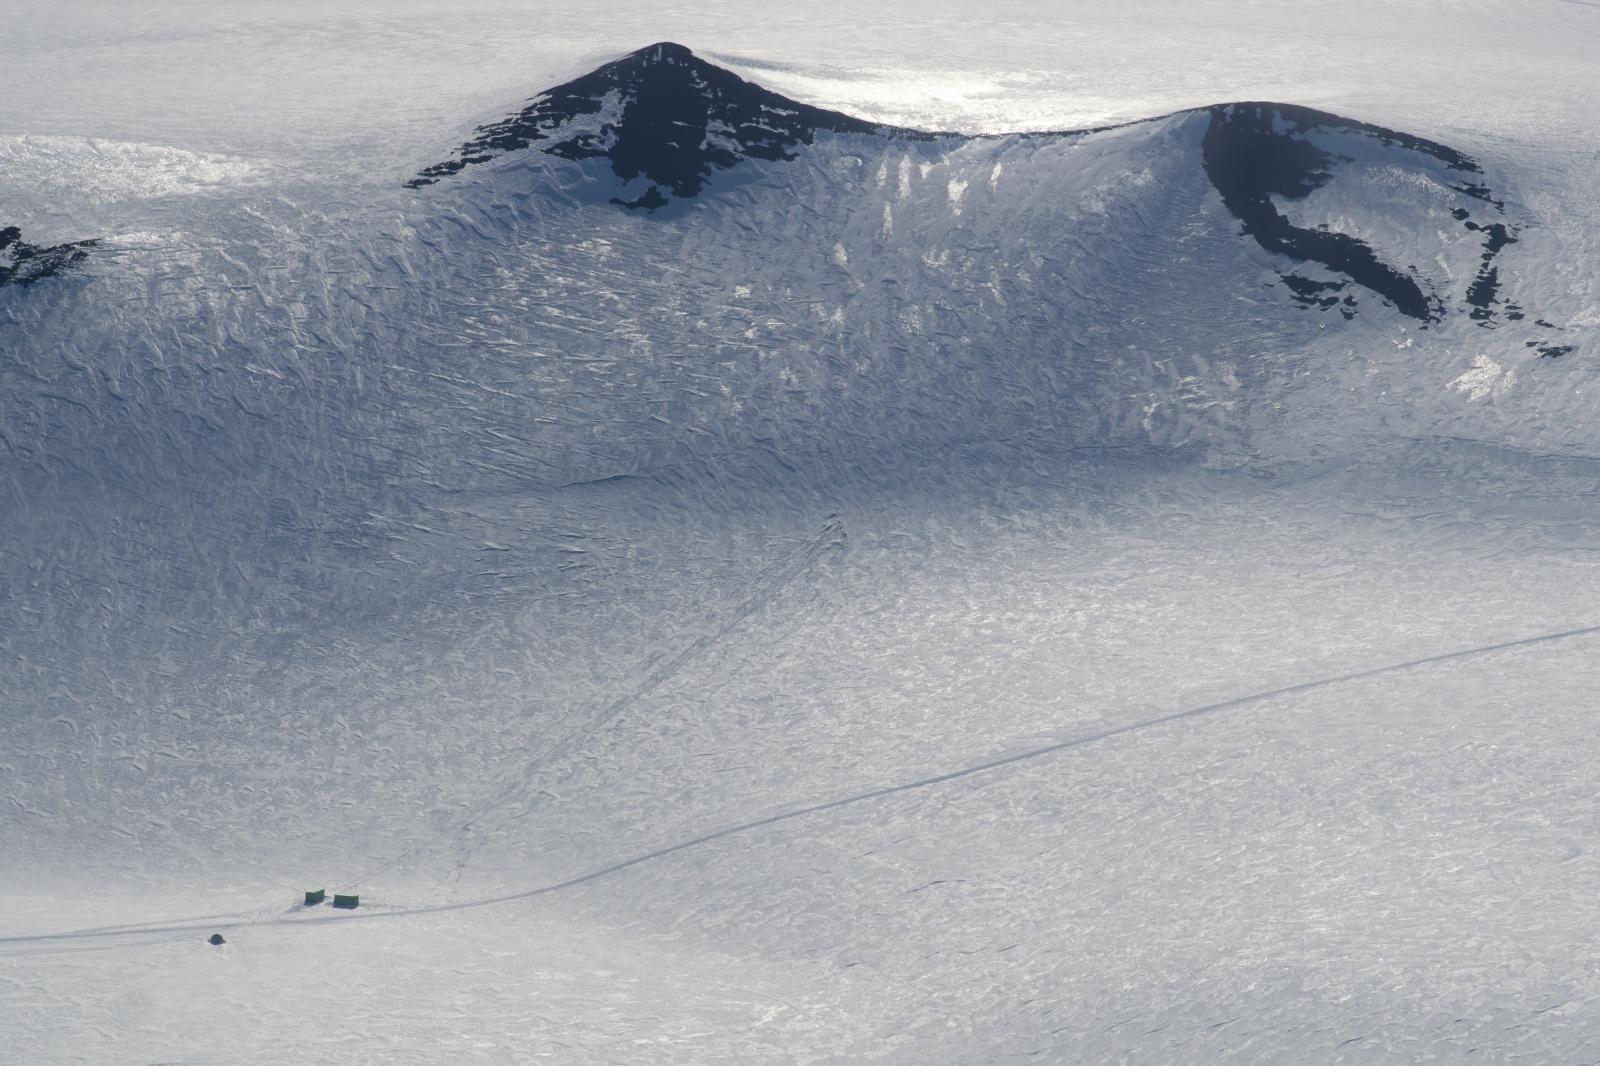 Hut Point Penninsula and ski tracks.